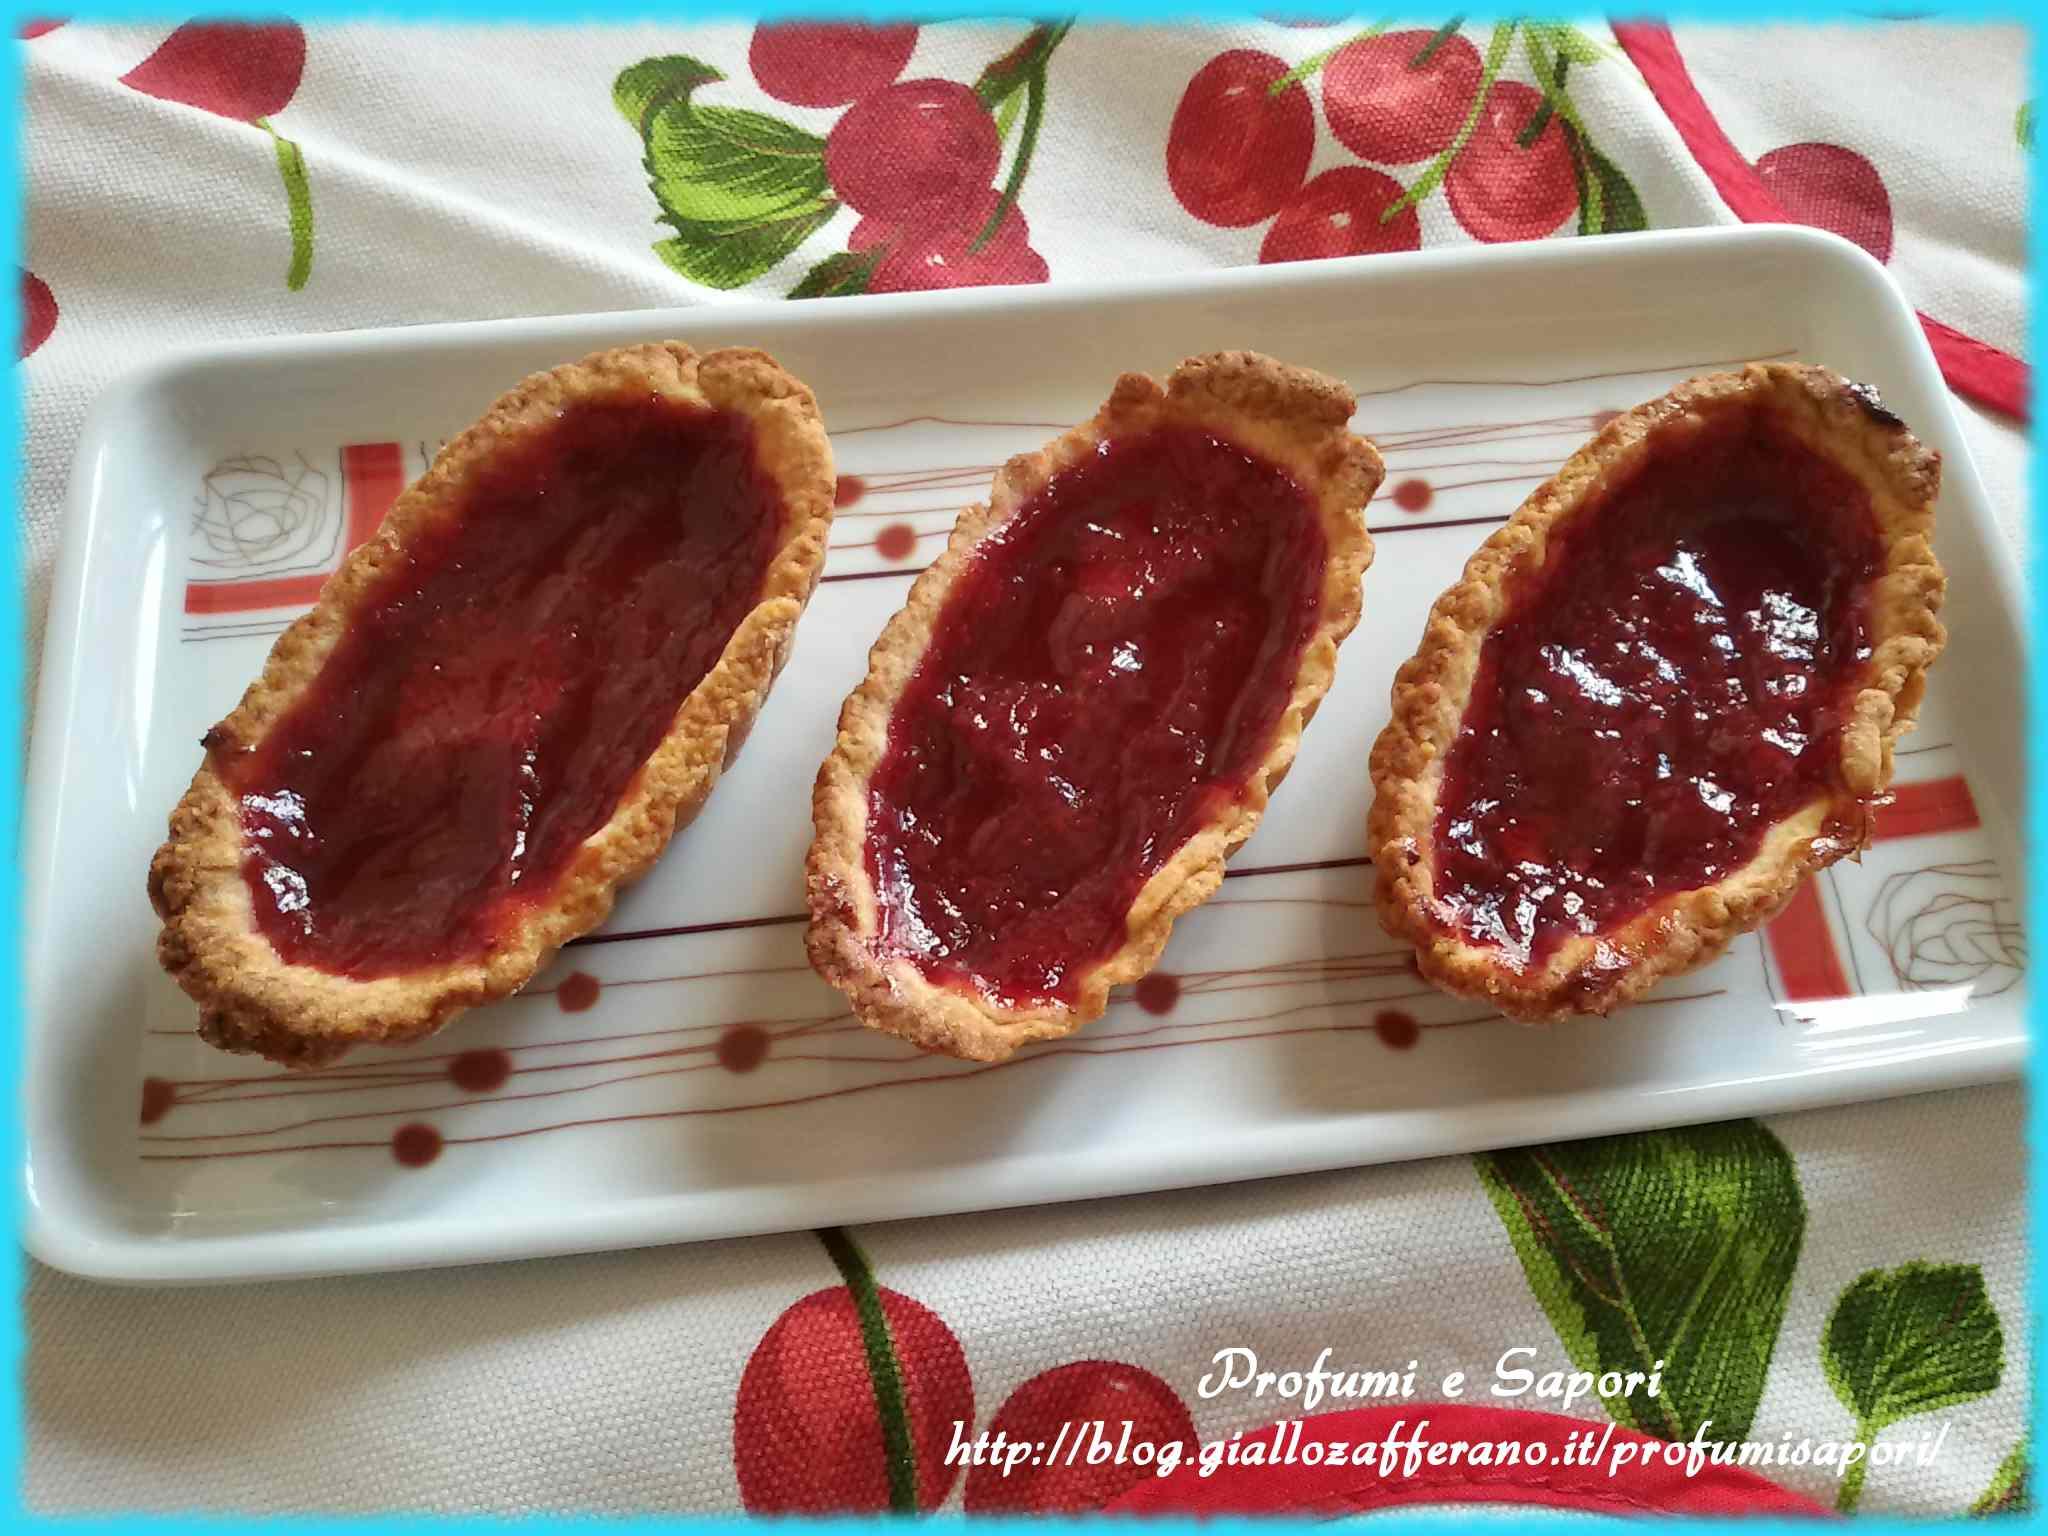 Ricetta: Barchette alla marmellata senza zucchero